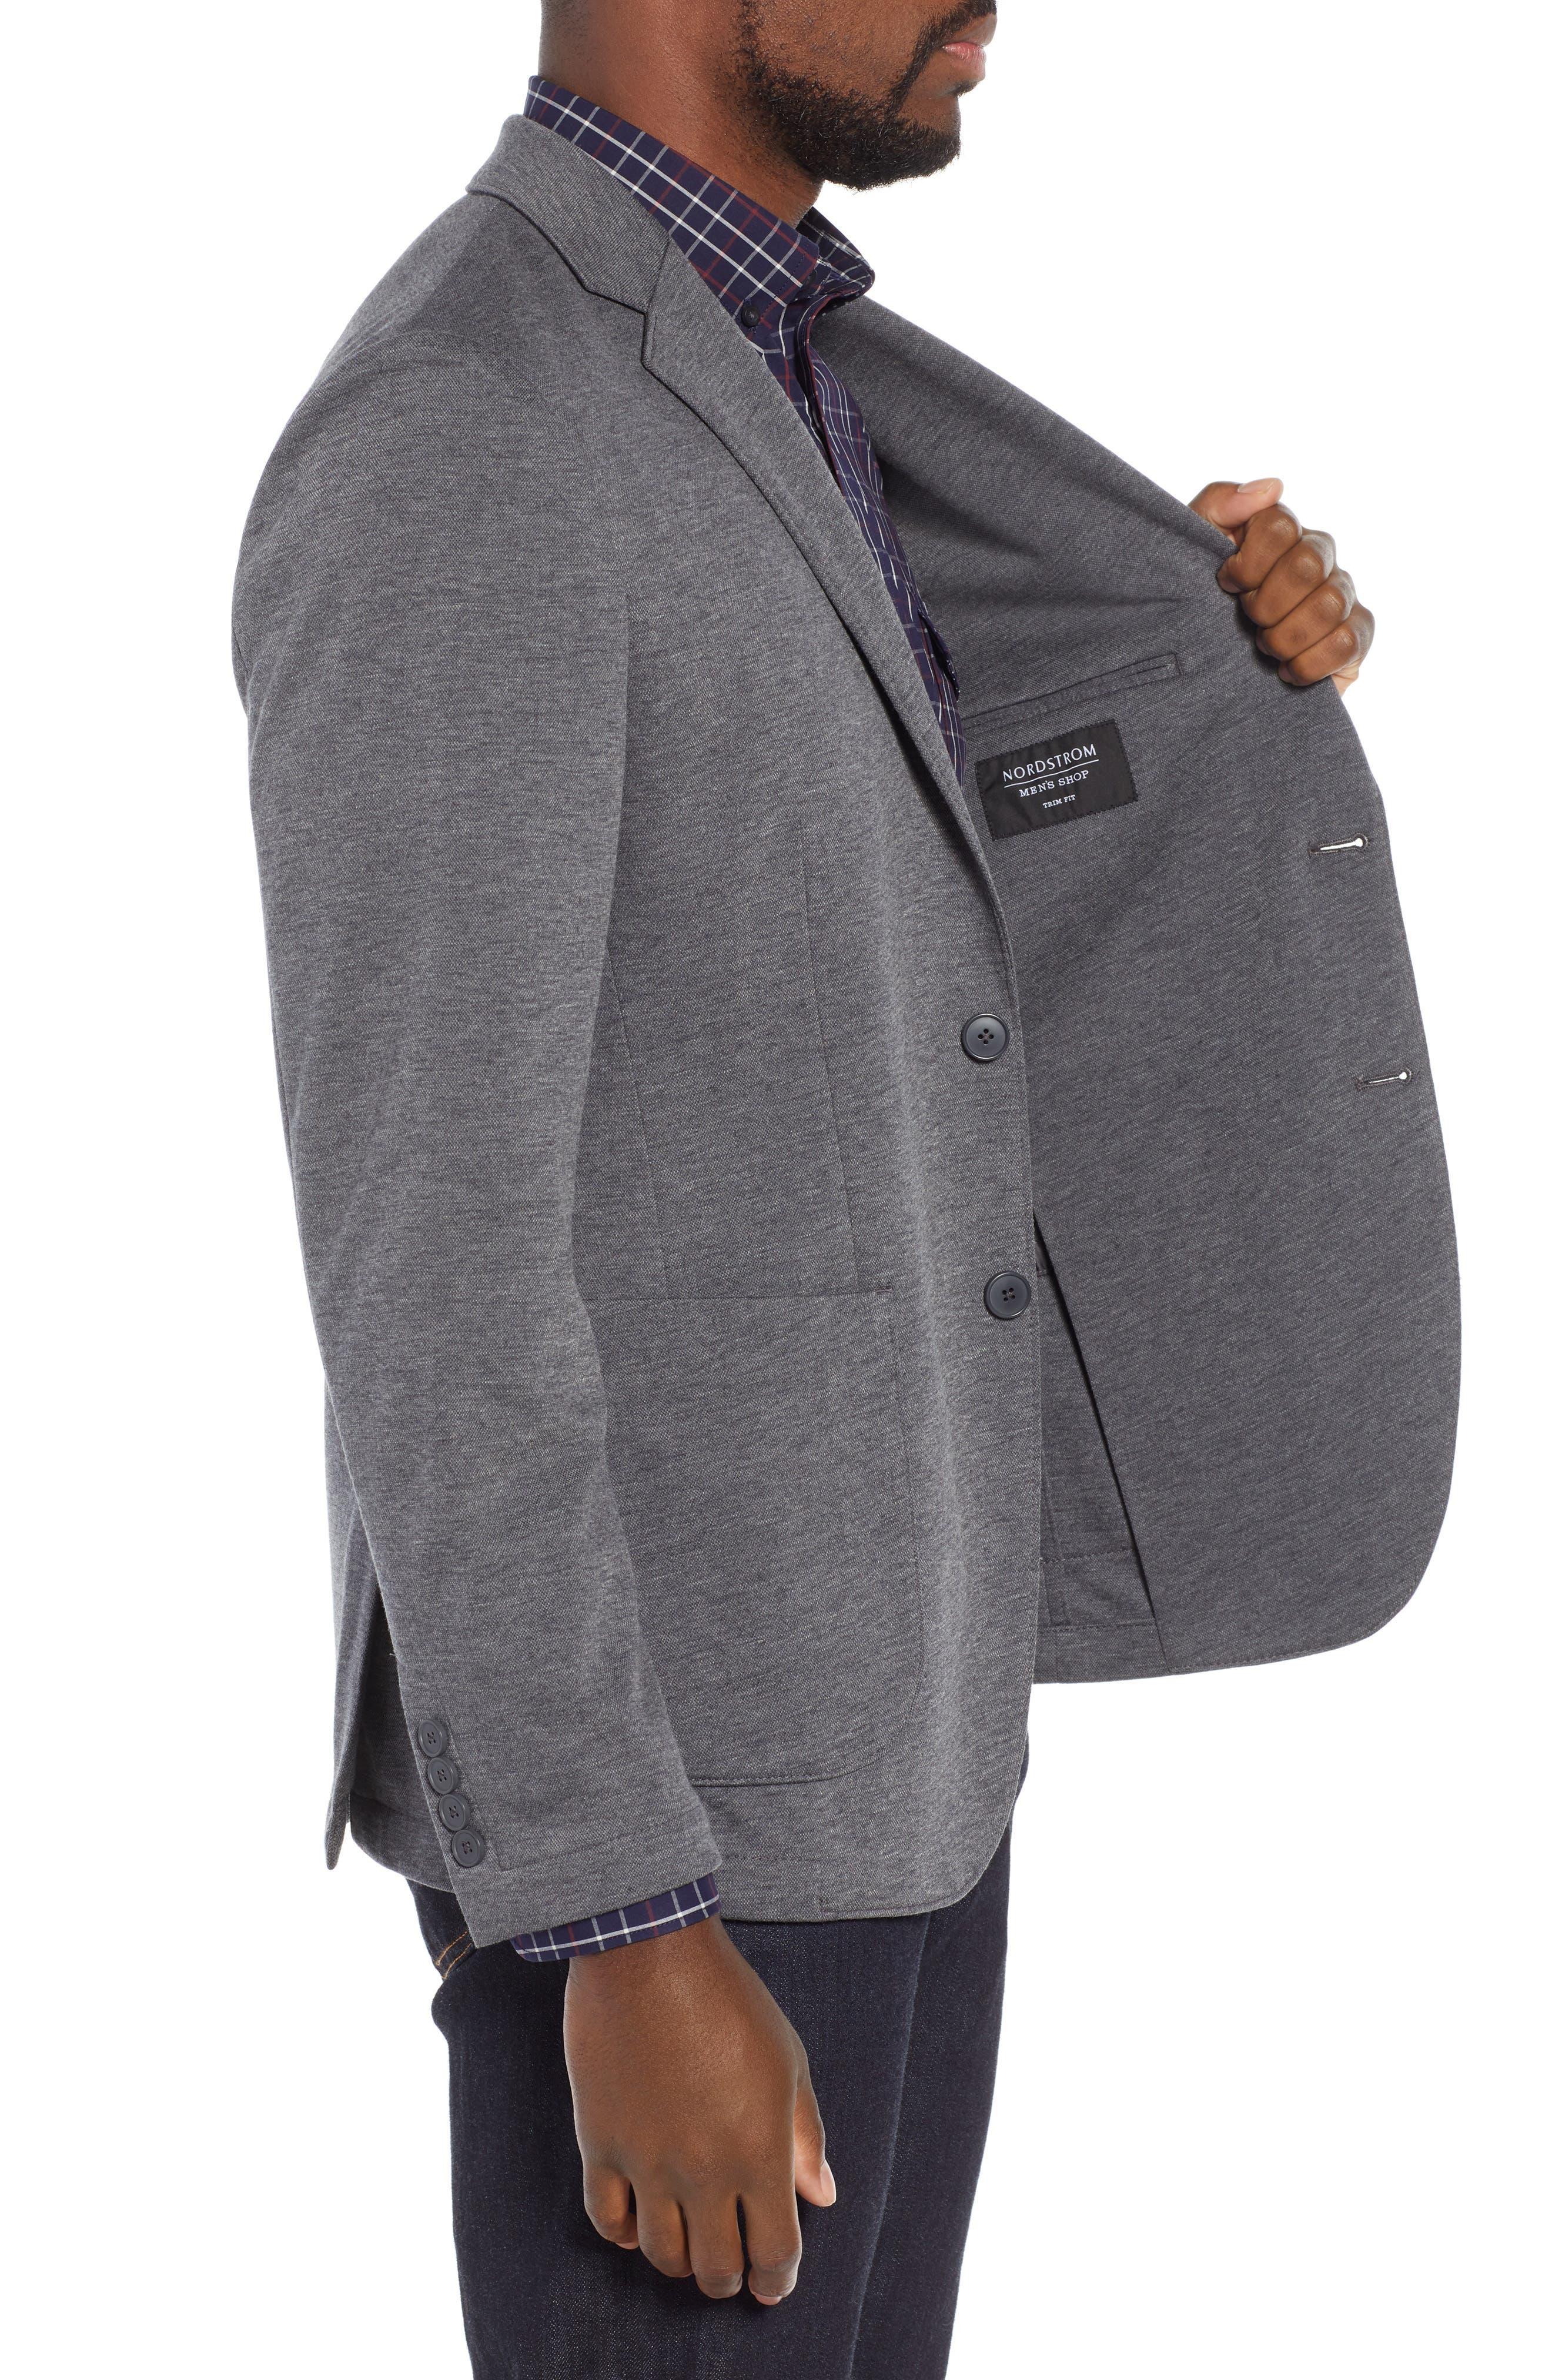 NORDSTROM MEN'S SHOP,                             Trim Fit Stretch Comfort Sport Coat,                             Alternate thumbnail 3, color,                             020